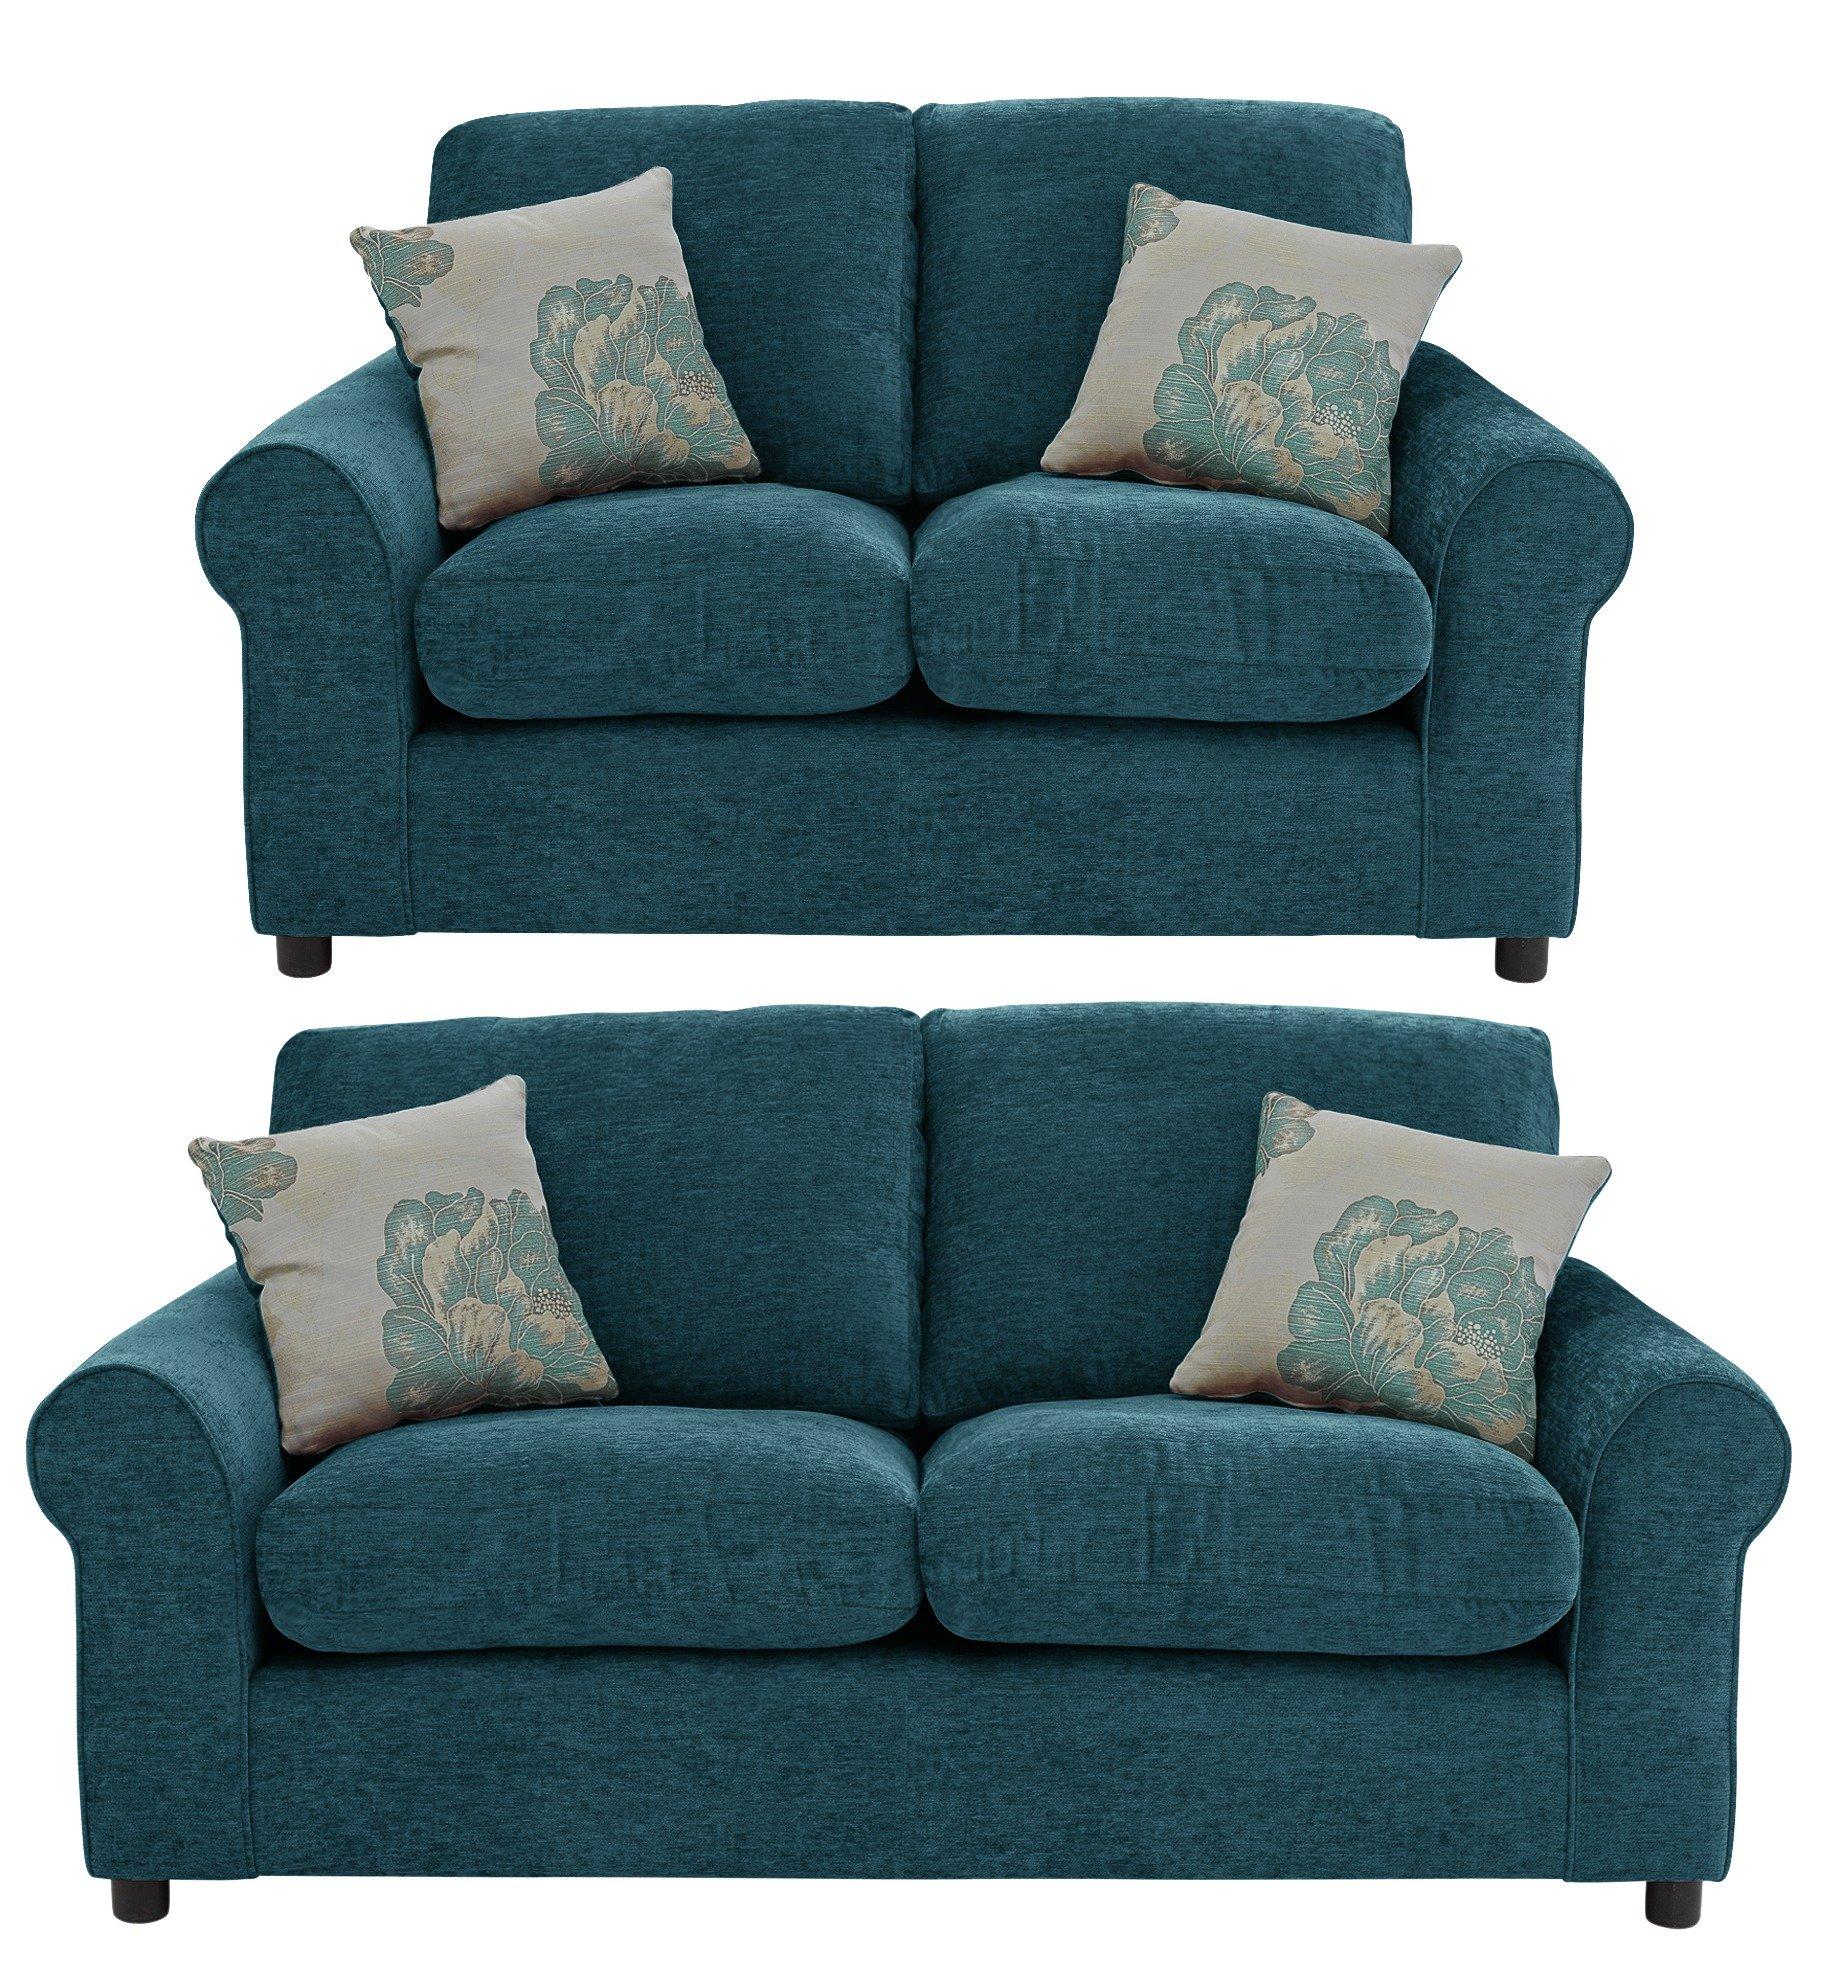 argos brooklyn sofa large nubuck leather cleaning home tessa and regular fabric teal